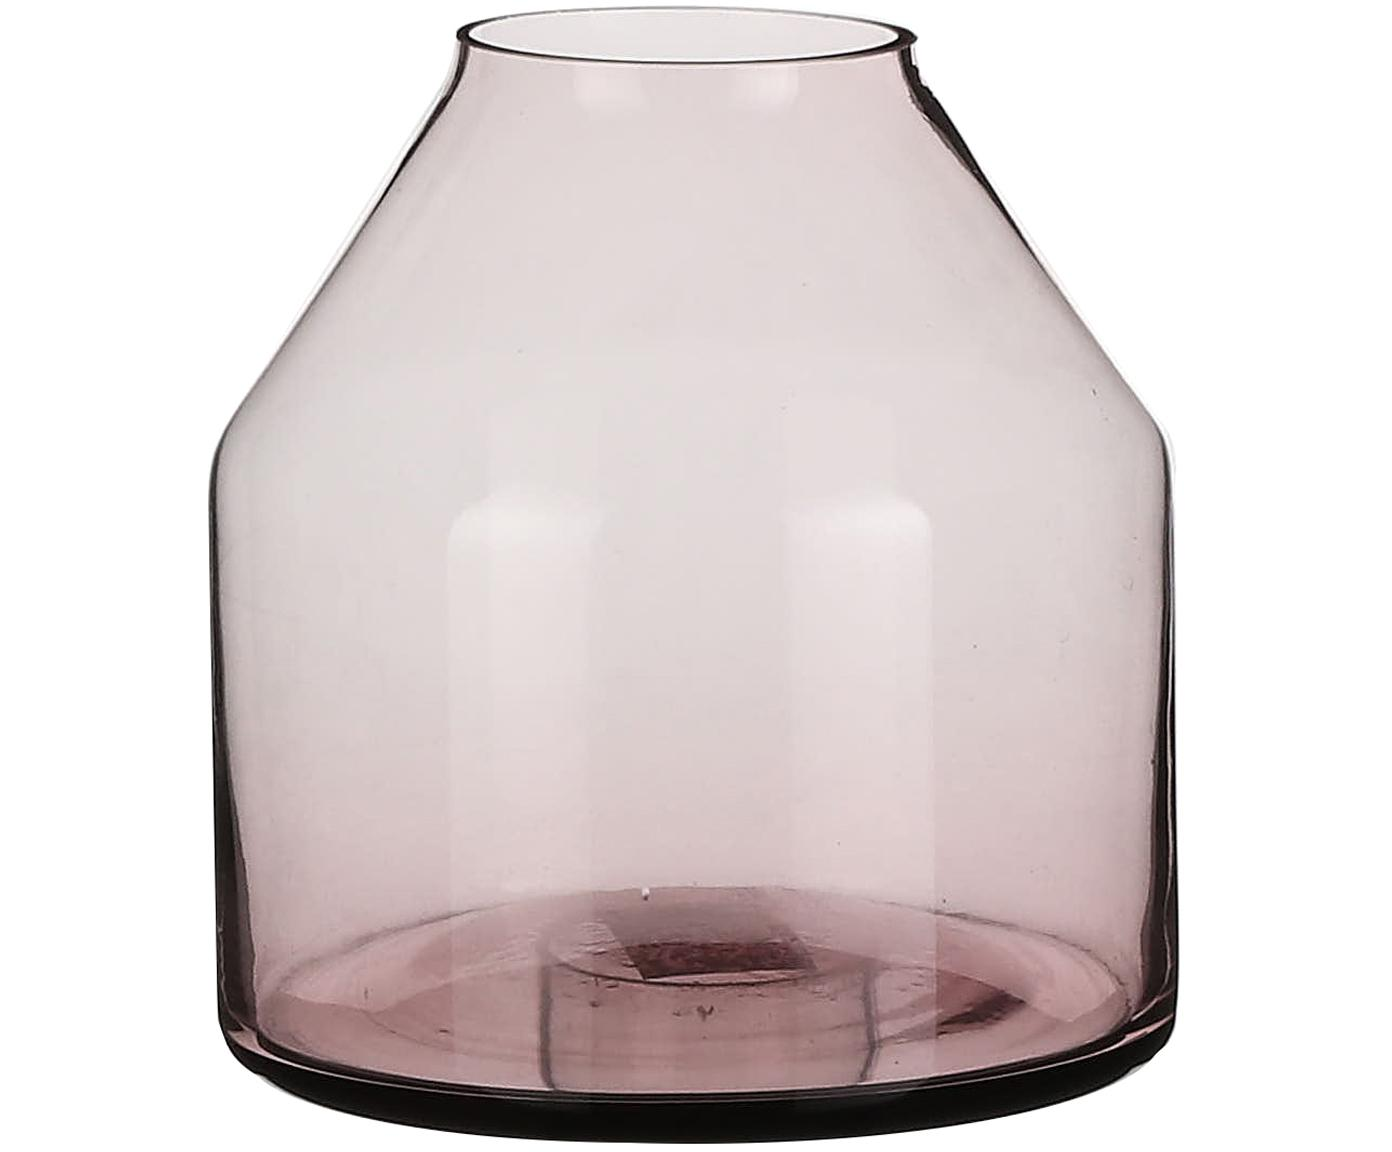 Vaas Farah, Glas, Lila, transparant, Ø 15 x H 15 cm